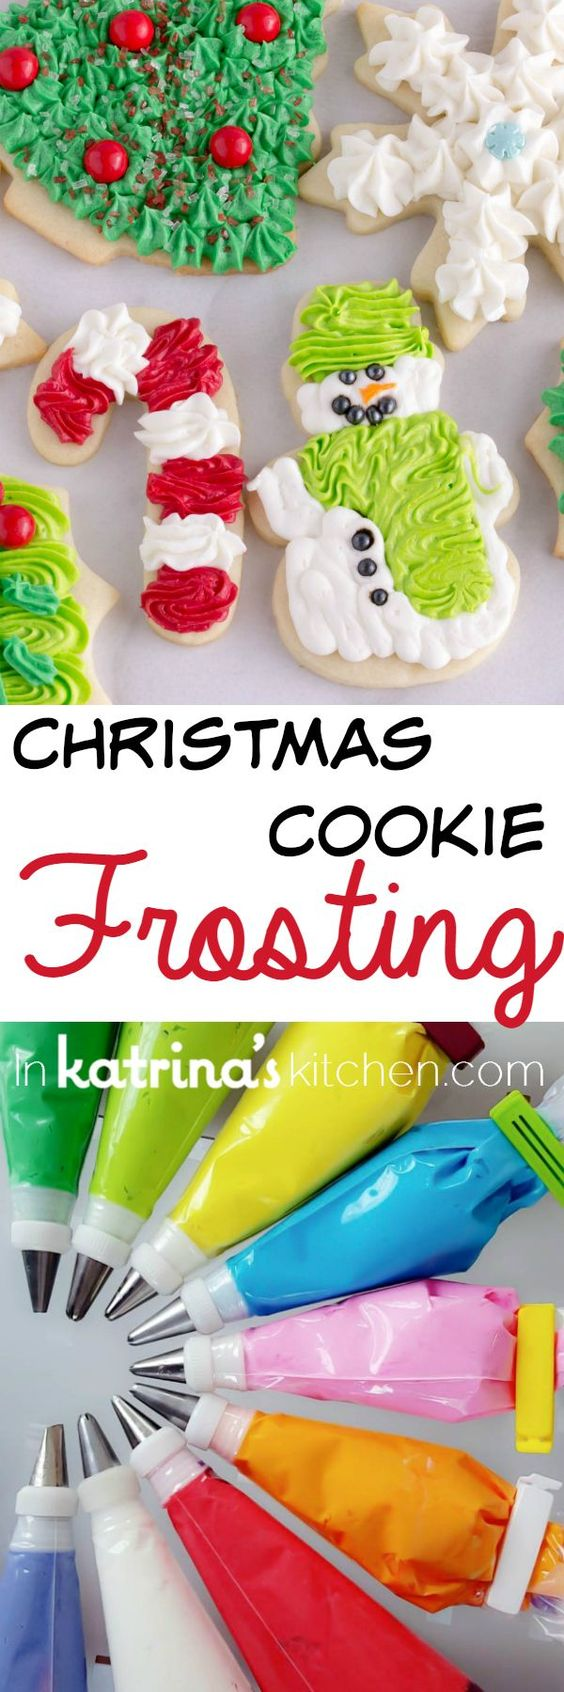 Cookie frosting recipe shortening